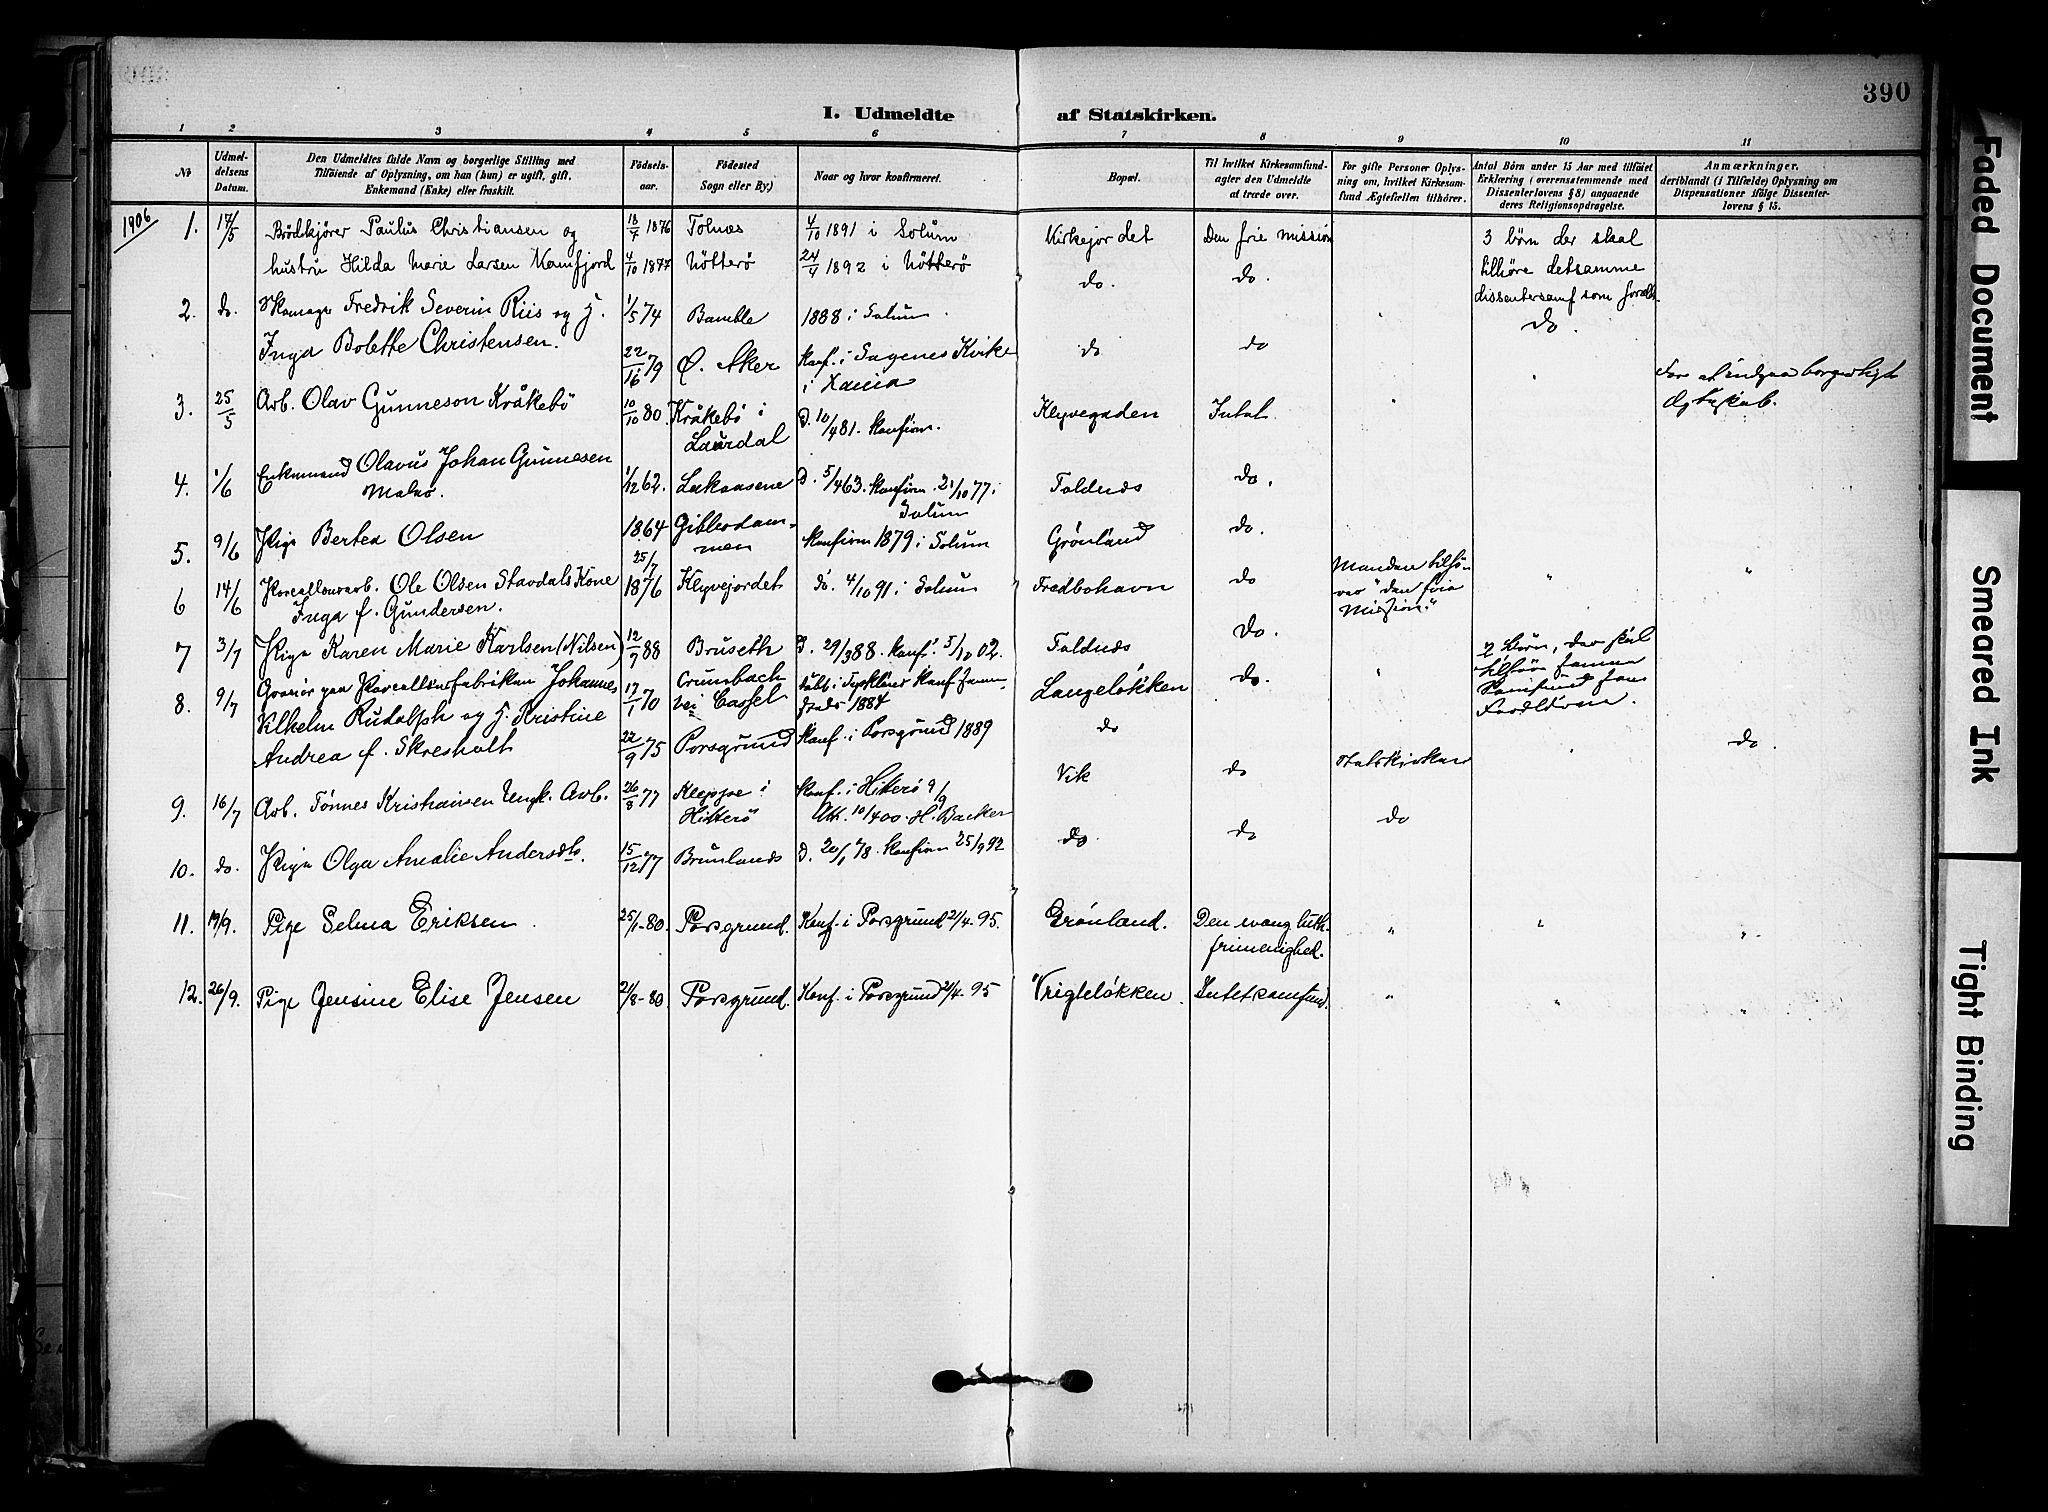 SAKO, Solum kirkebøker, F/Fa/L0011: Ministerialbok nr. I 11, 1898-1909, s. 390